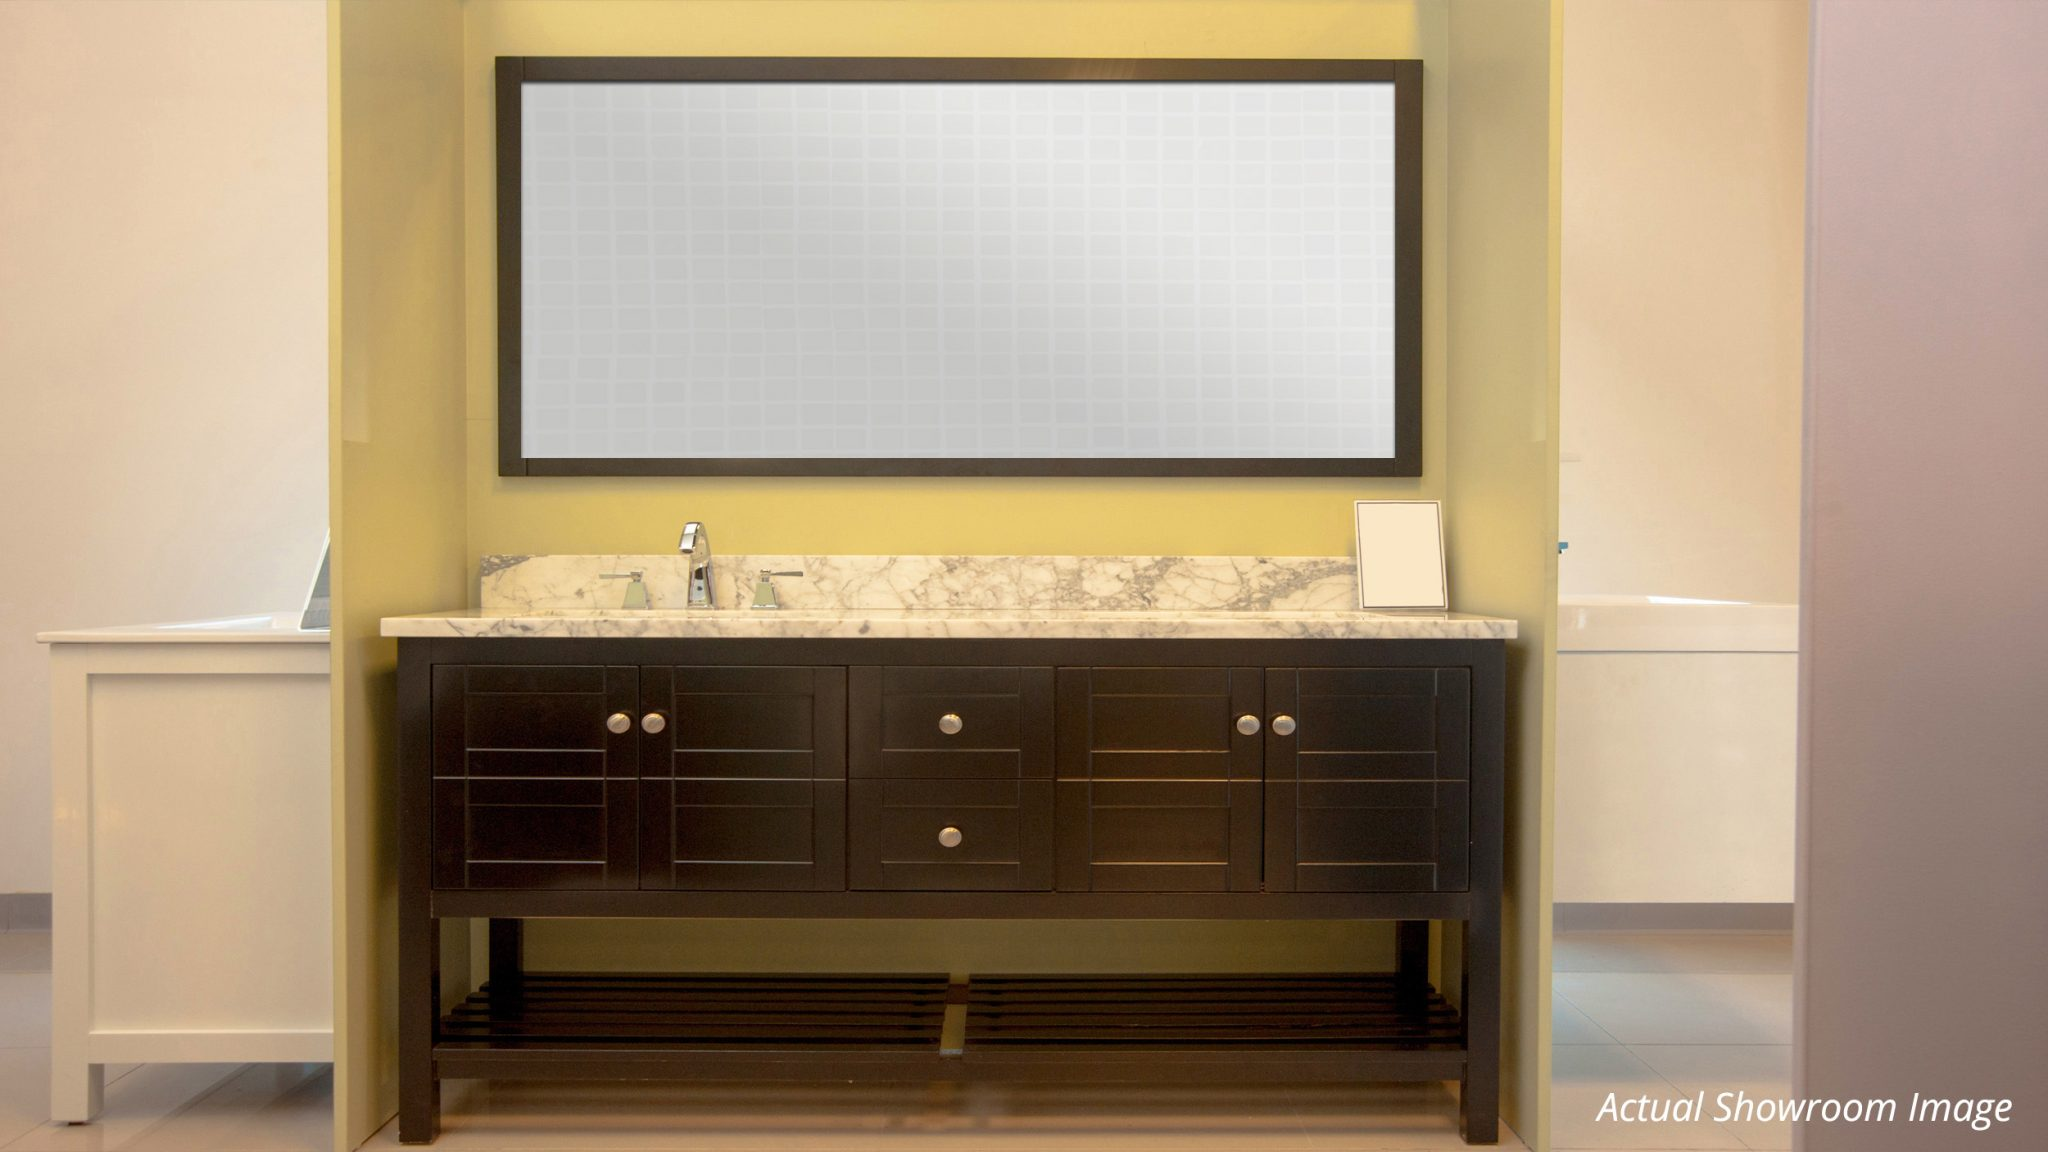 Groovy Bathroom Supplies Philadelphia Remodeling Bathroom Interior Design Ideas Gentotryabchikinfo